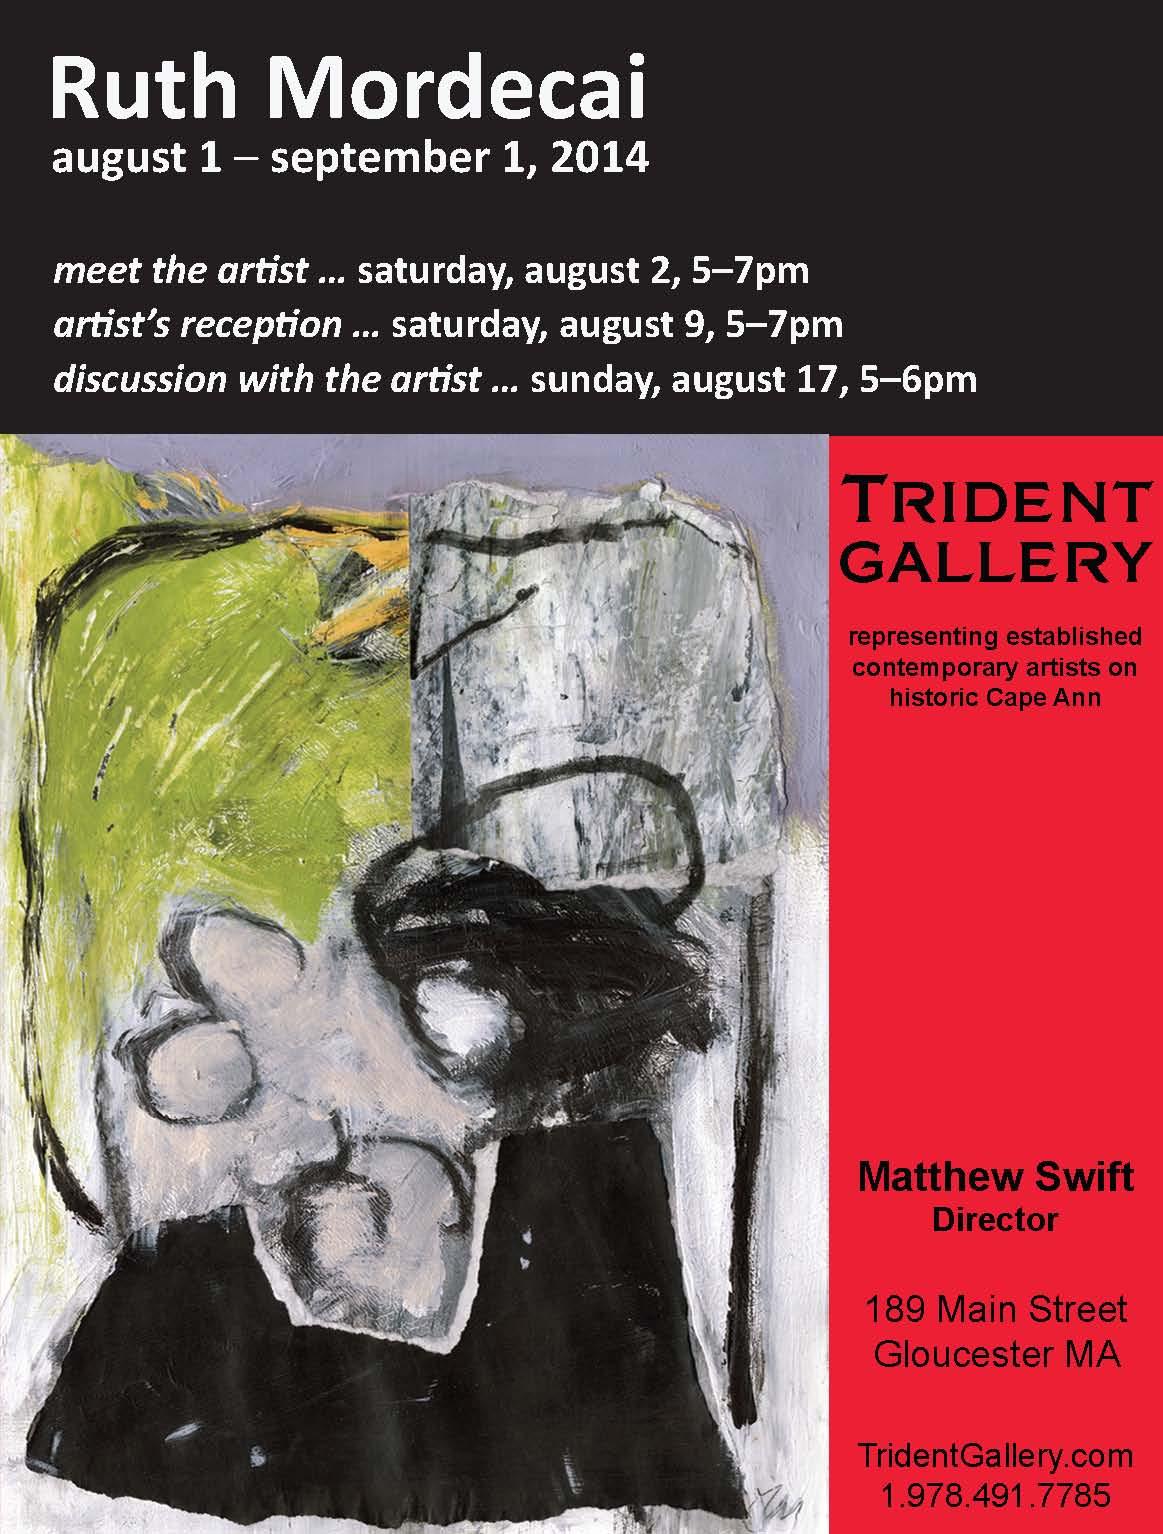 Ruth Mordecai Trident Gallery exhibit